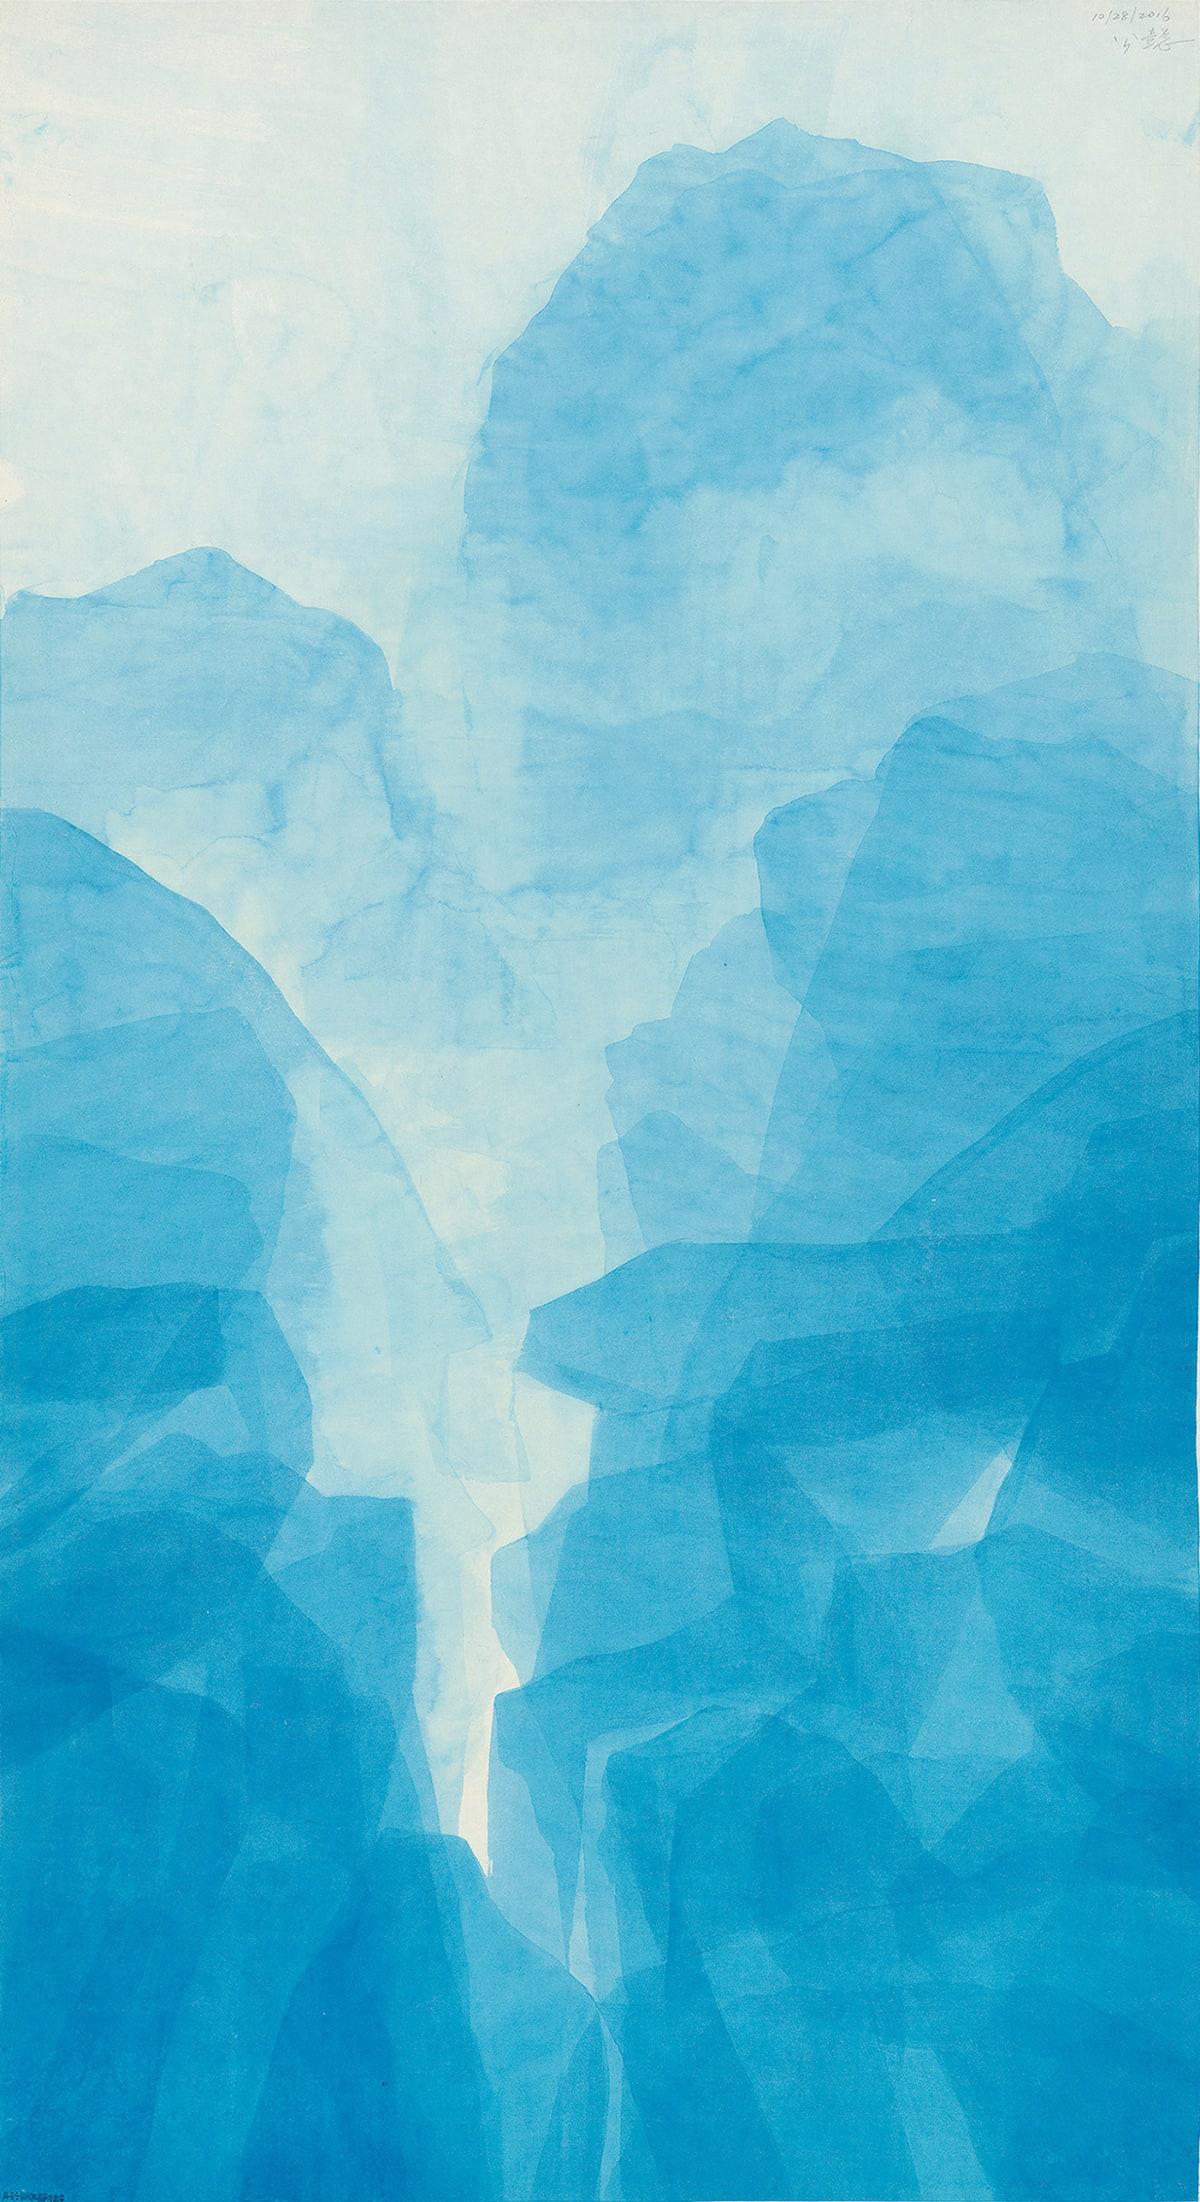 Wang Gongyi 王公懿, Blue Mountains 藍山 1028, 2016